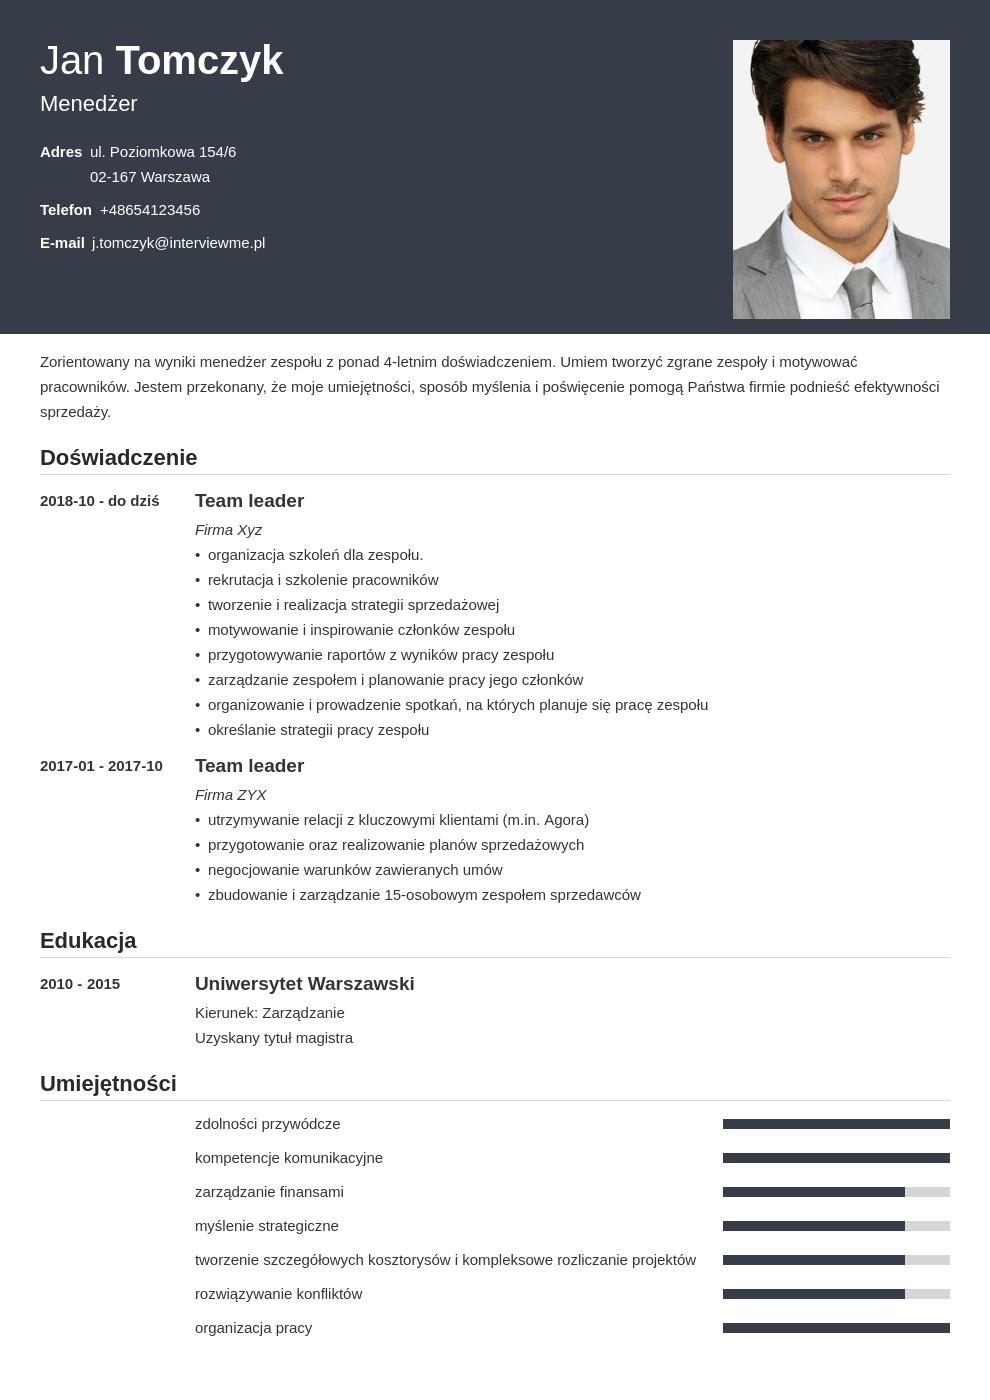 cv list motywacyjny managera template influx